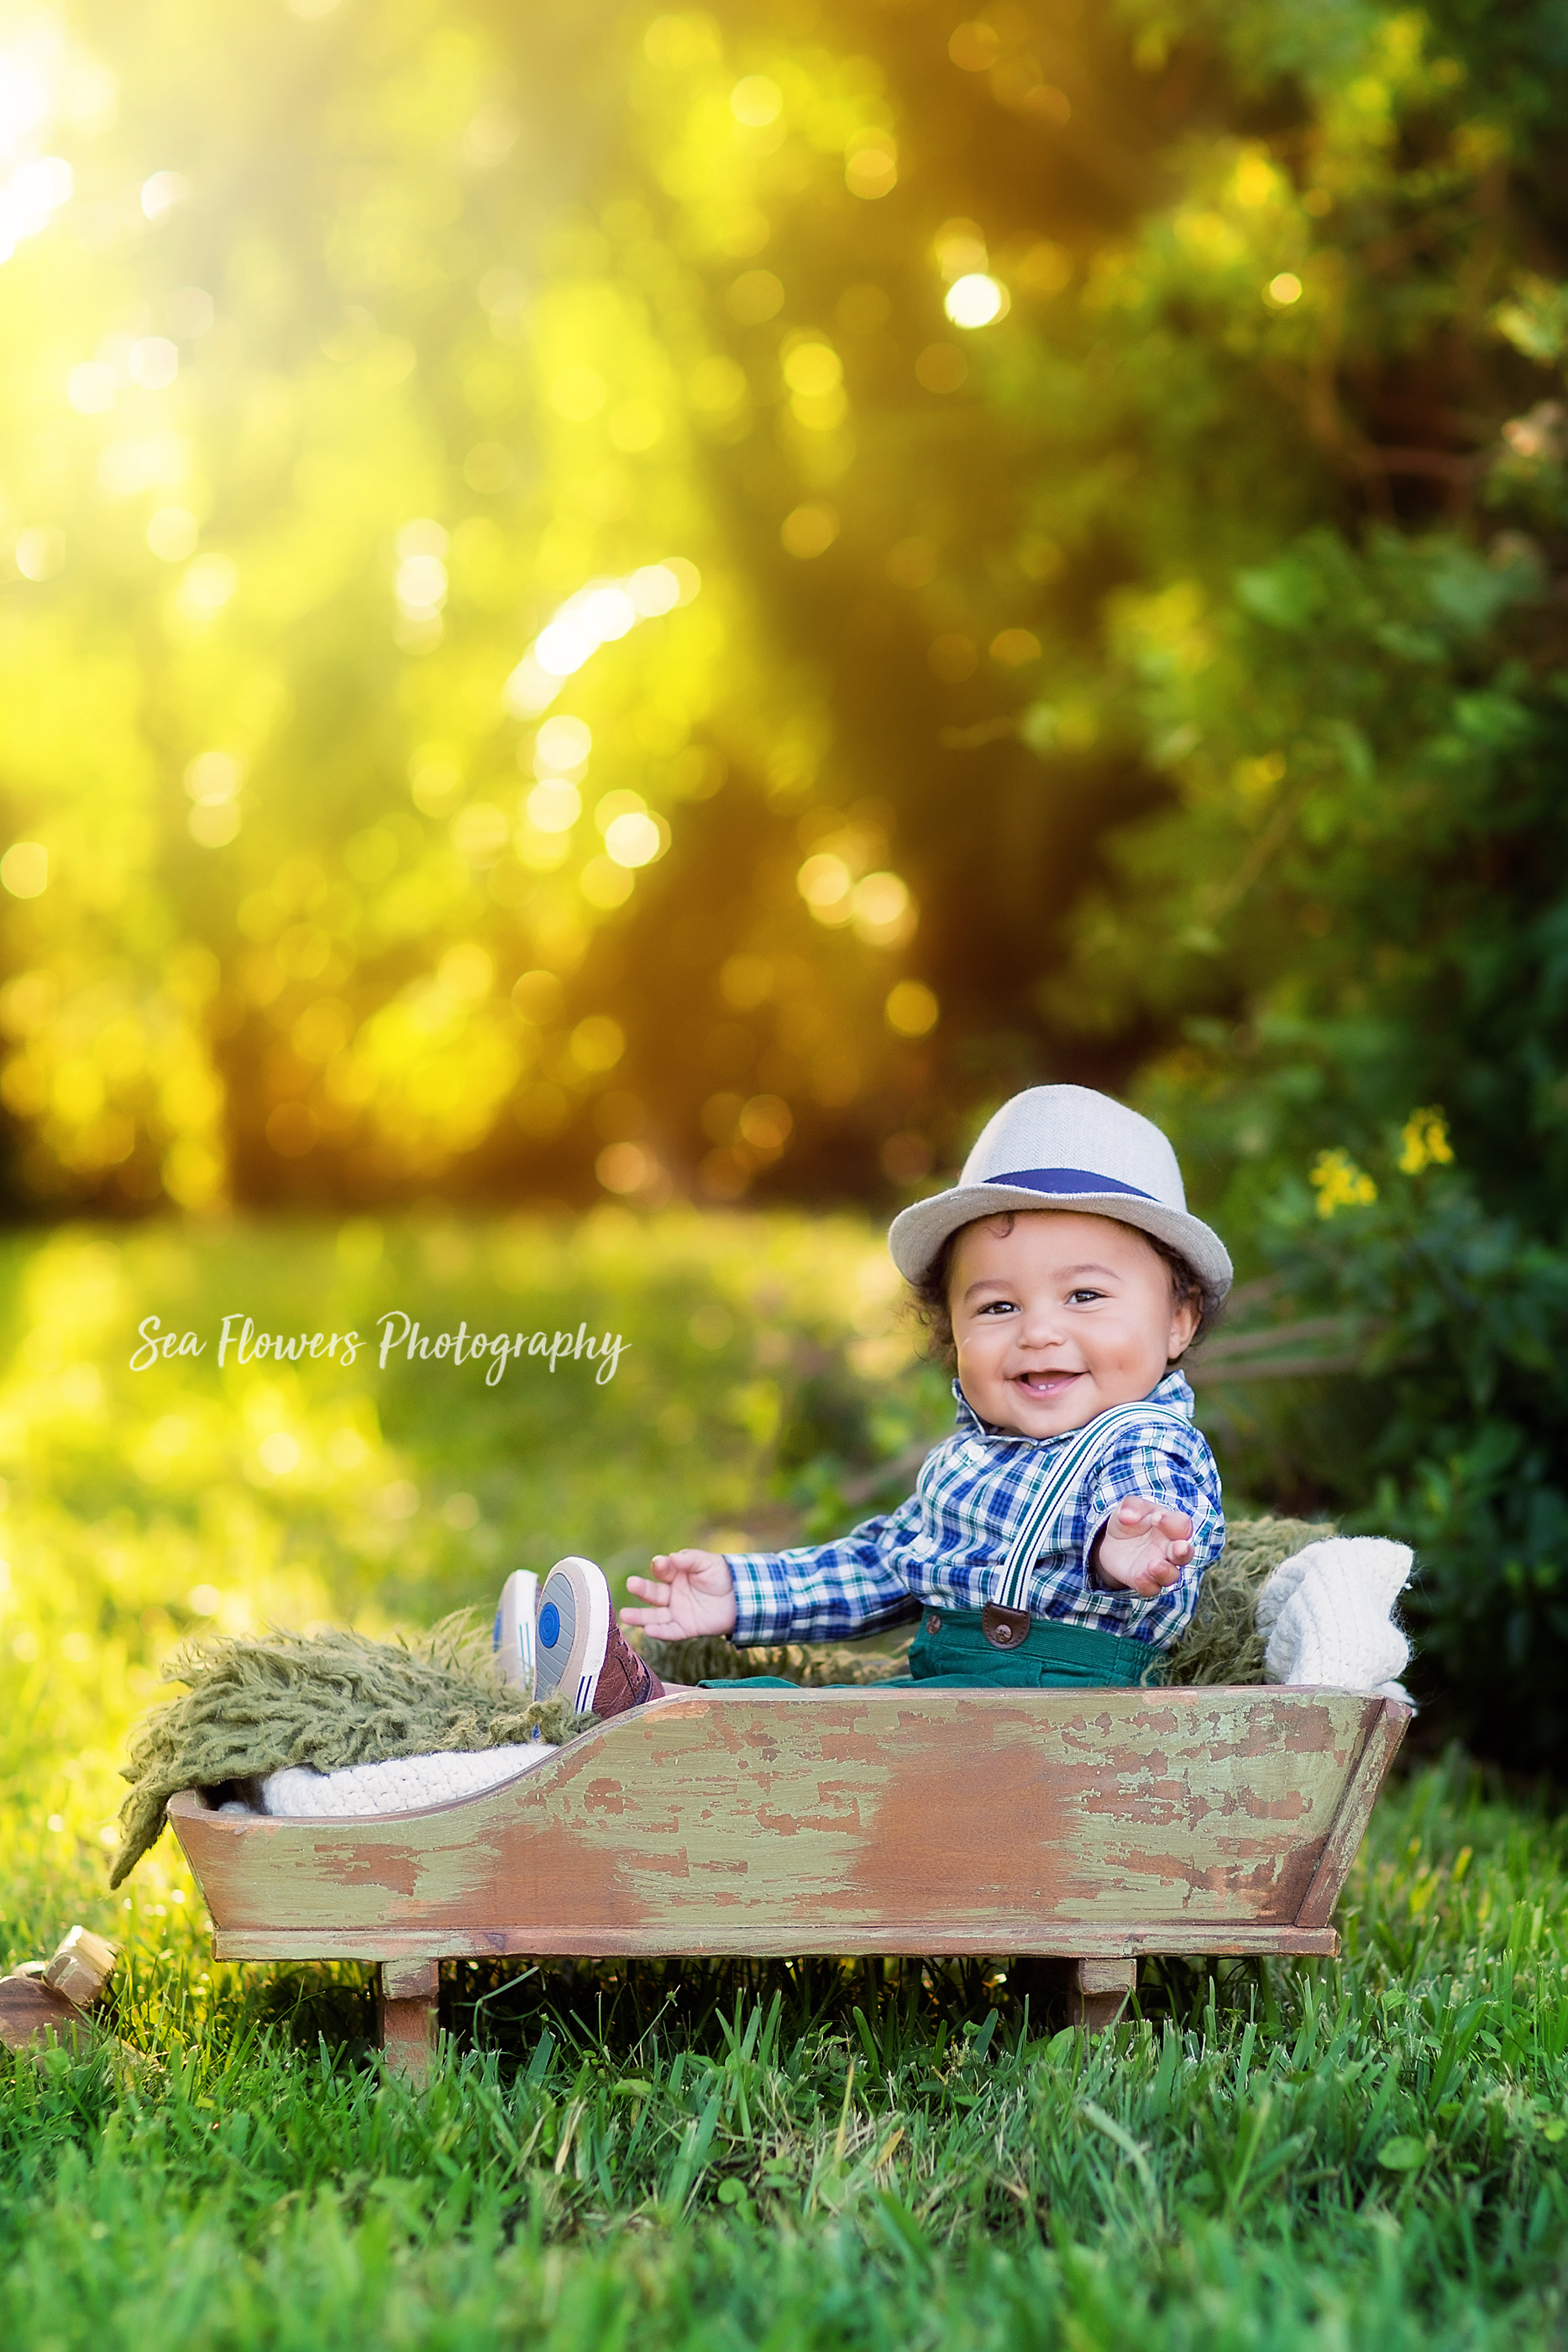 Jupiter Child Photographer - Chirstmas Mini Sessions - Sea Flowers Photography